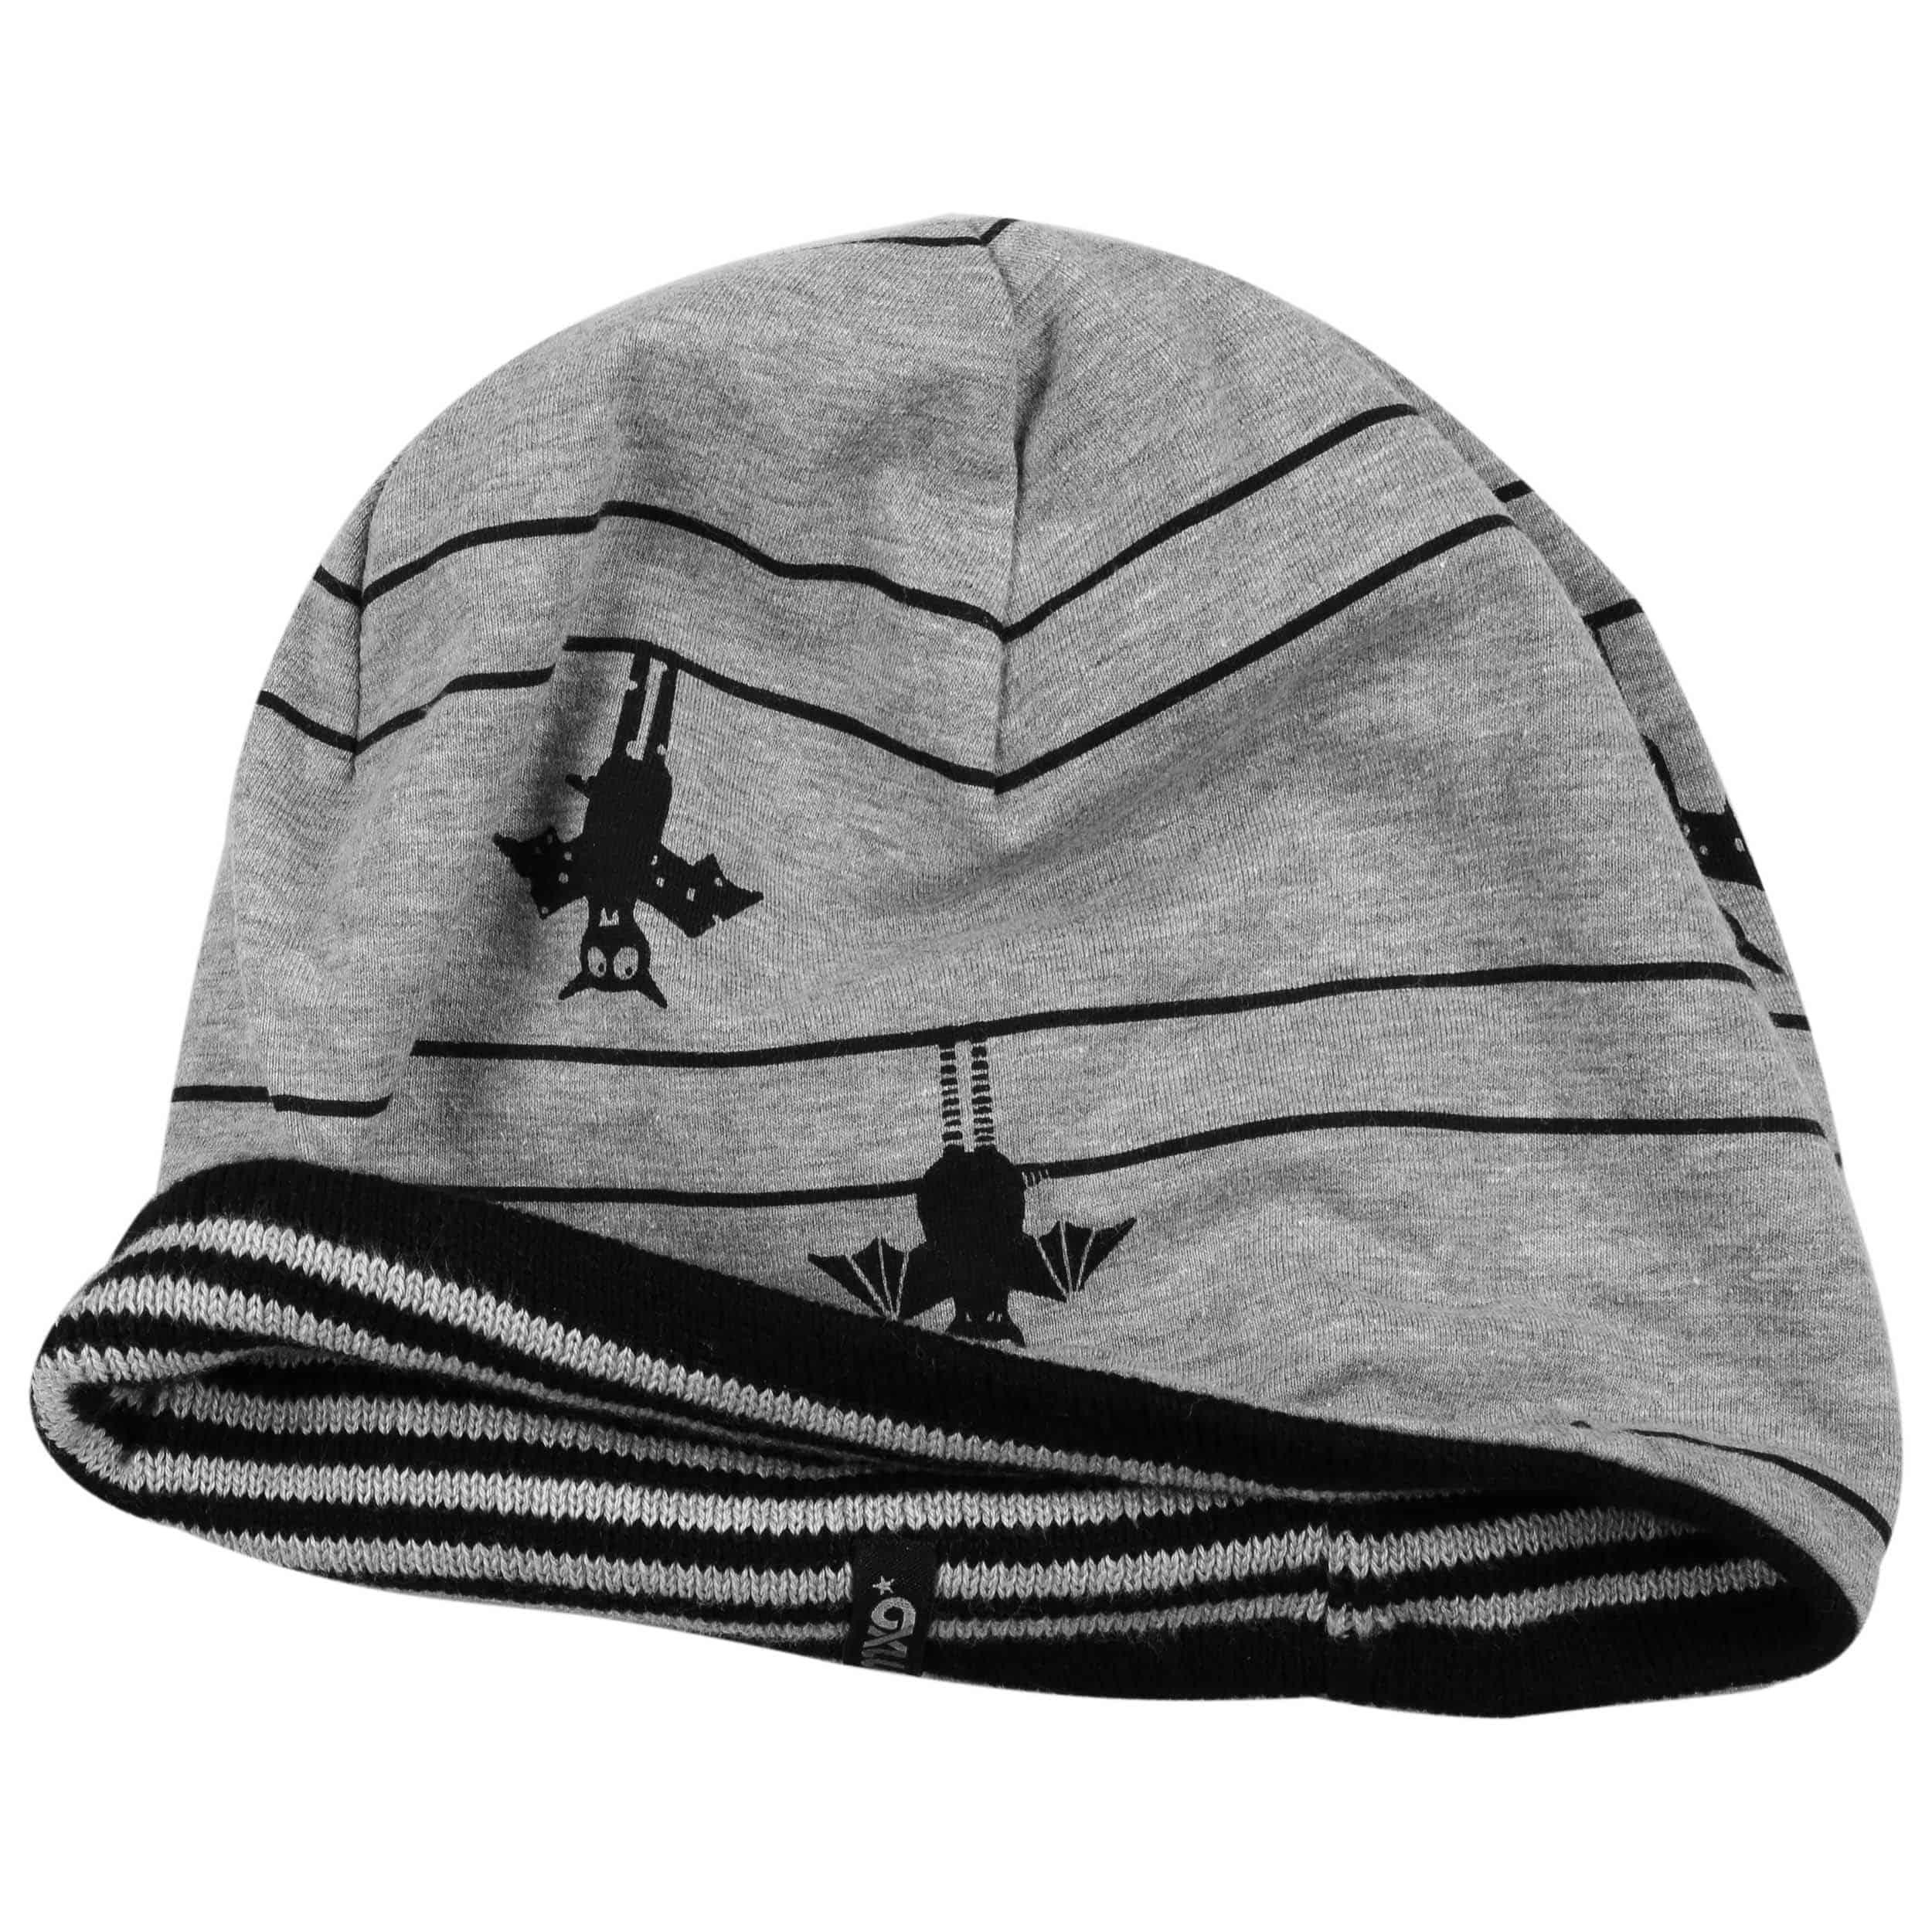 b67b15260d9 ... Bat-Stripes Kids Reversible Beanie by maximo - black-grey 2 ...